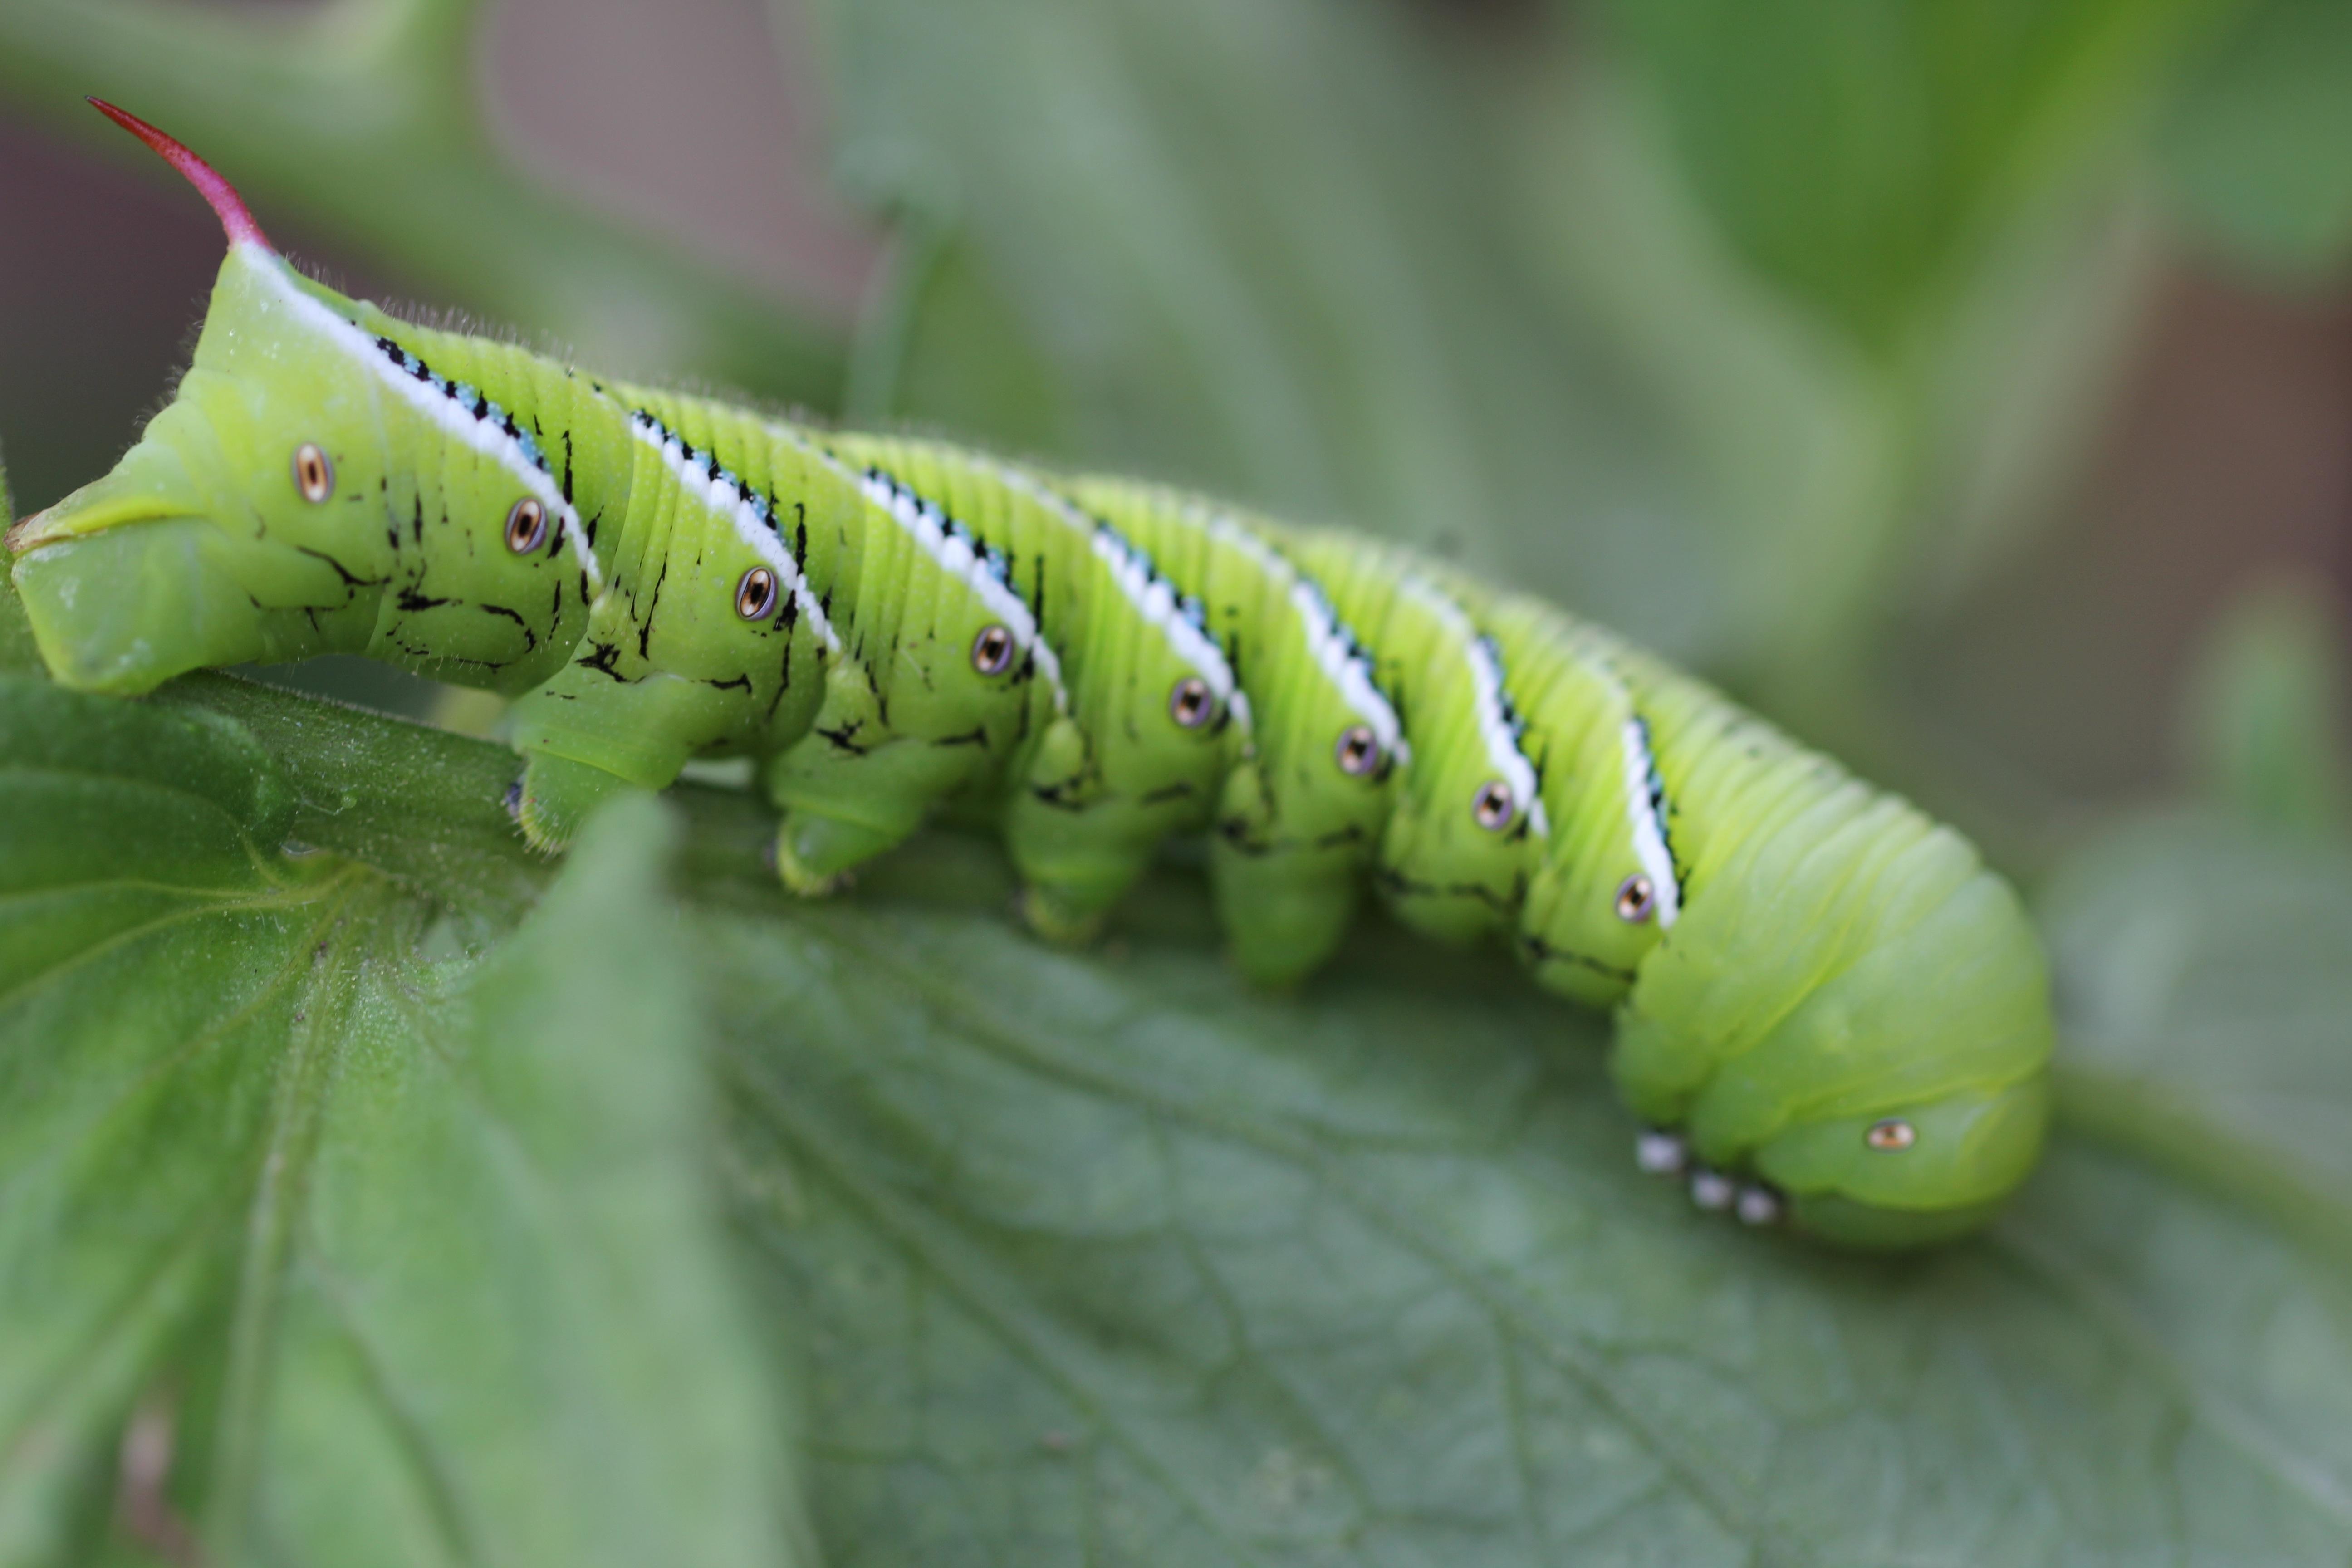 Bildet : natur, grønn, insekt, hage, fauna, virvelløse ...